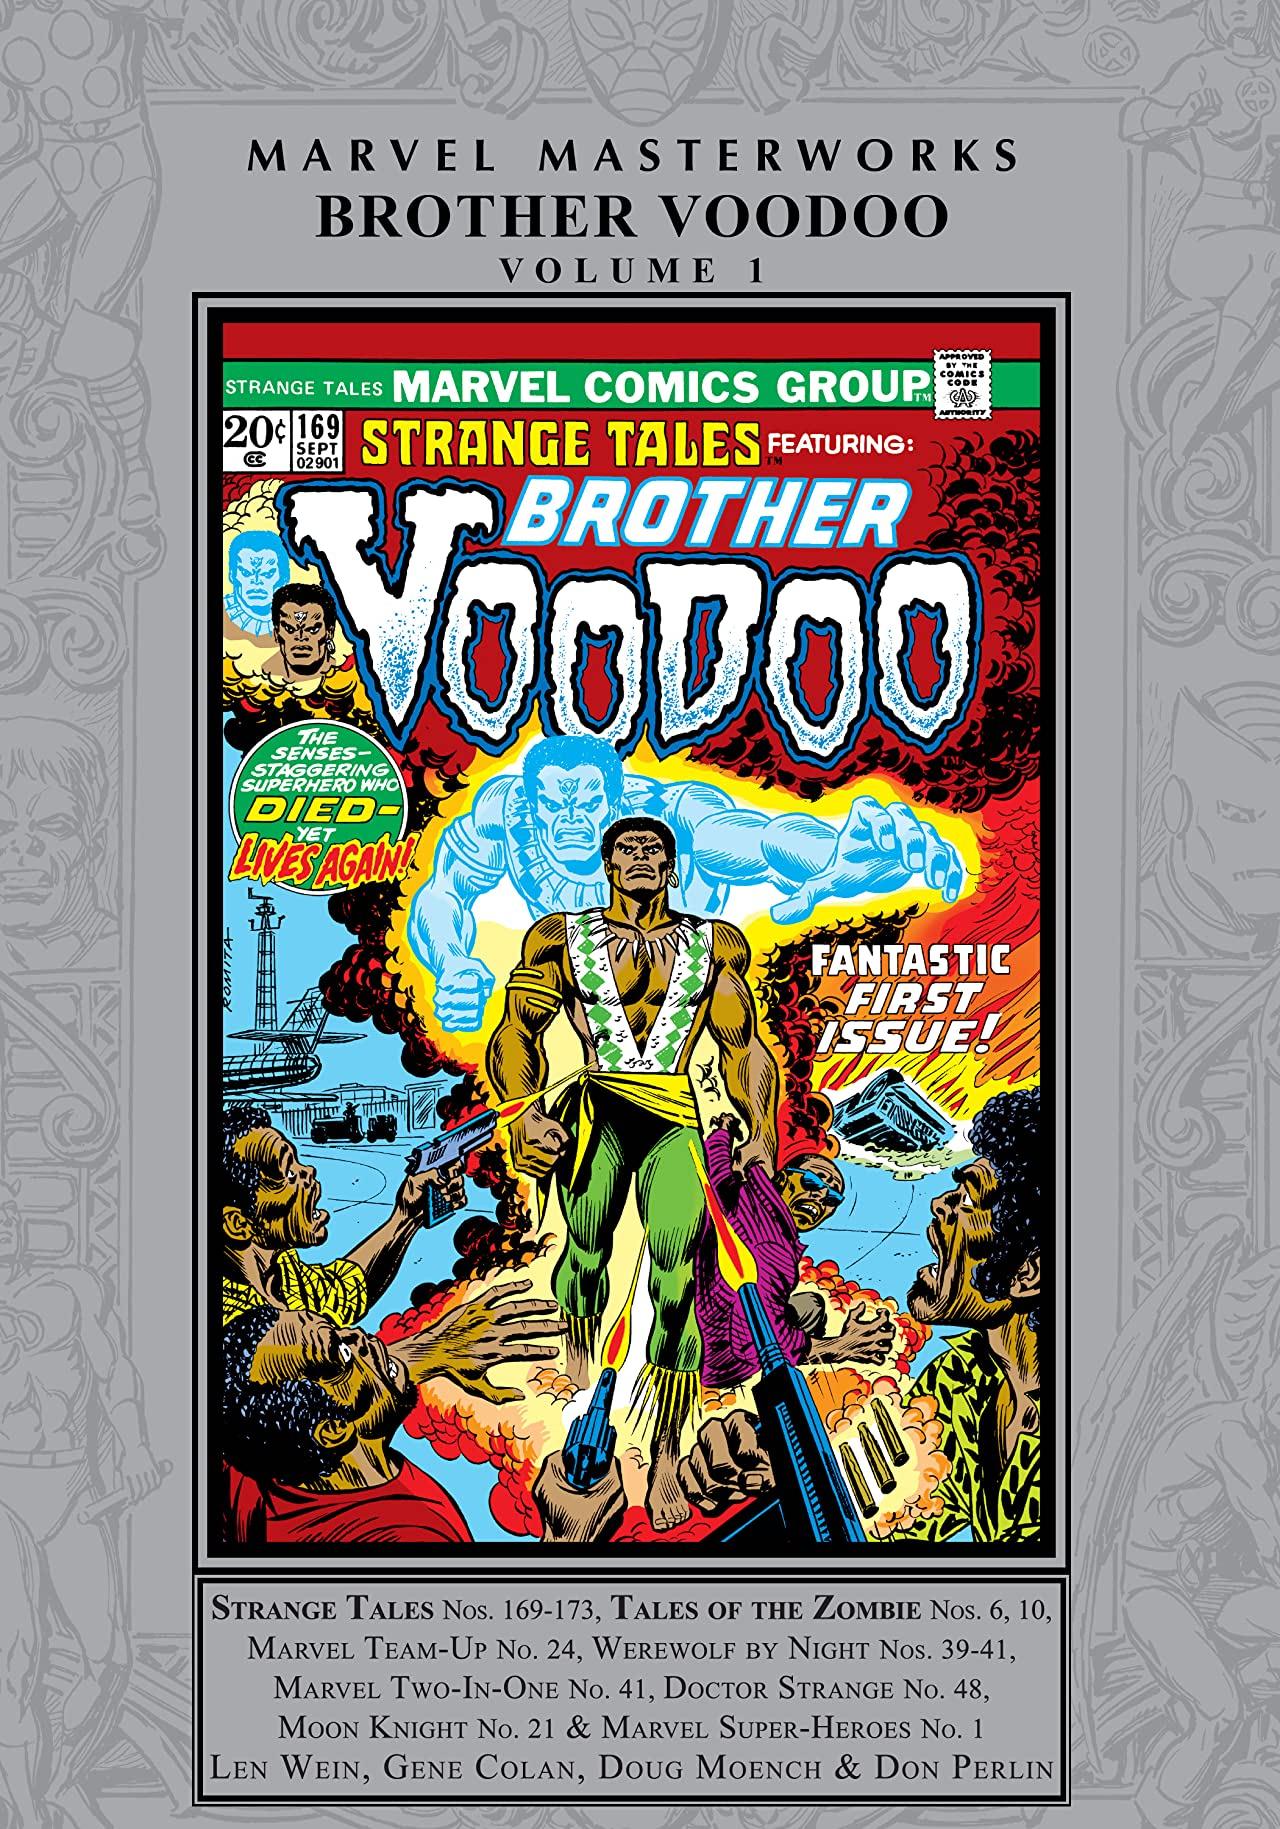 Marvel Masterworks: Brother Voodoo Vol. 1 (Hardcover)